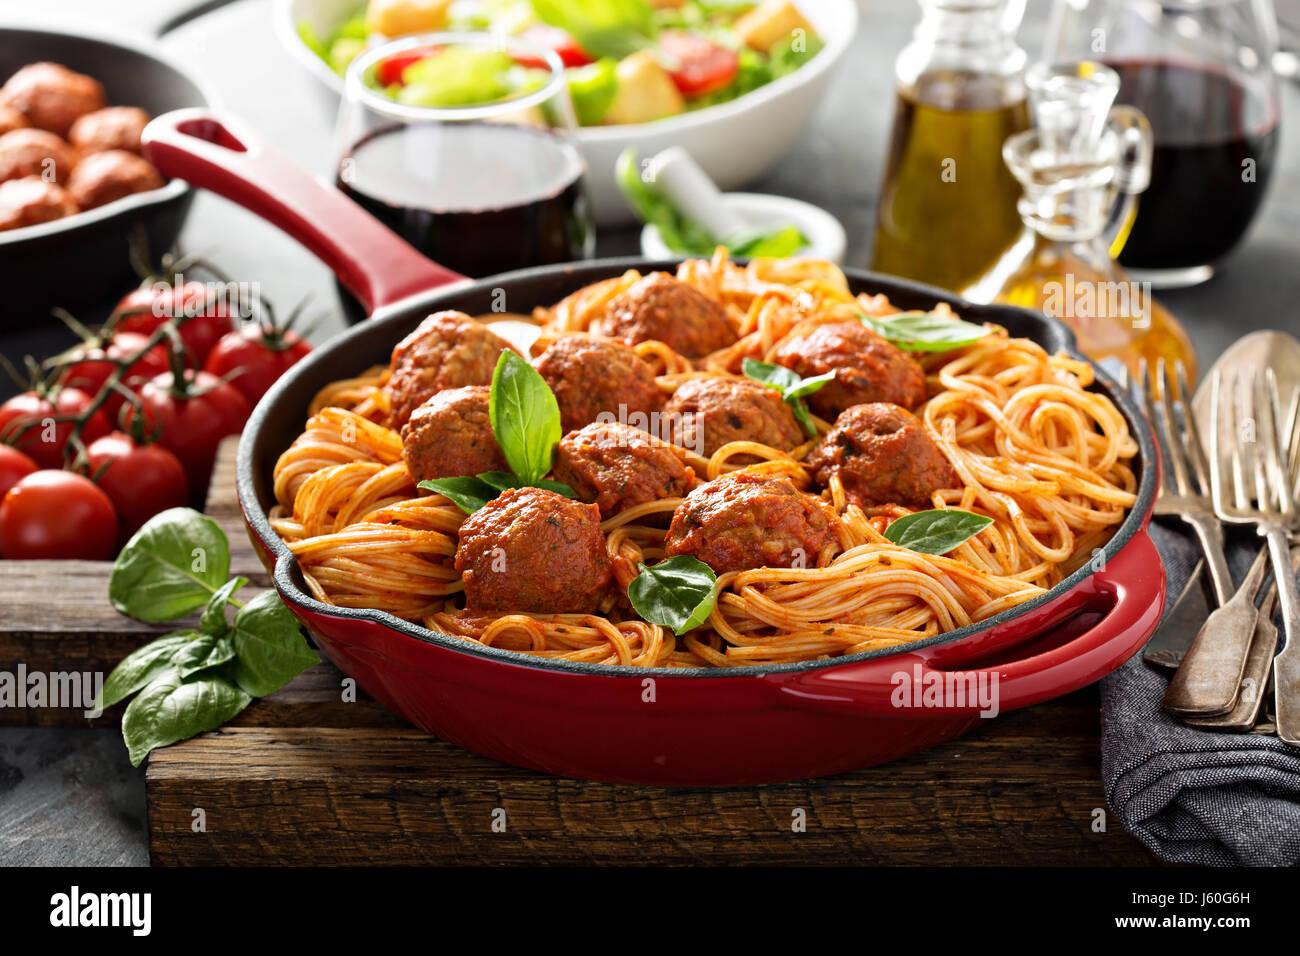 Spaghetti à la sauce tomate et boulettes de viande Photo Stock